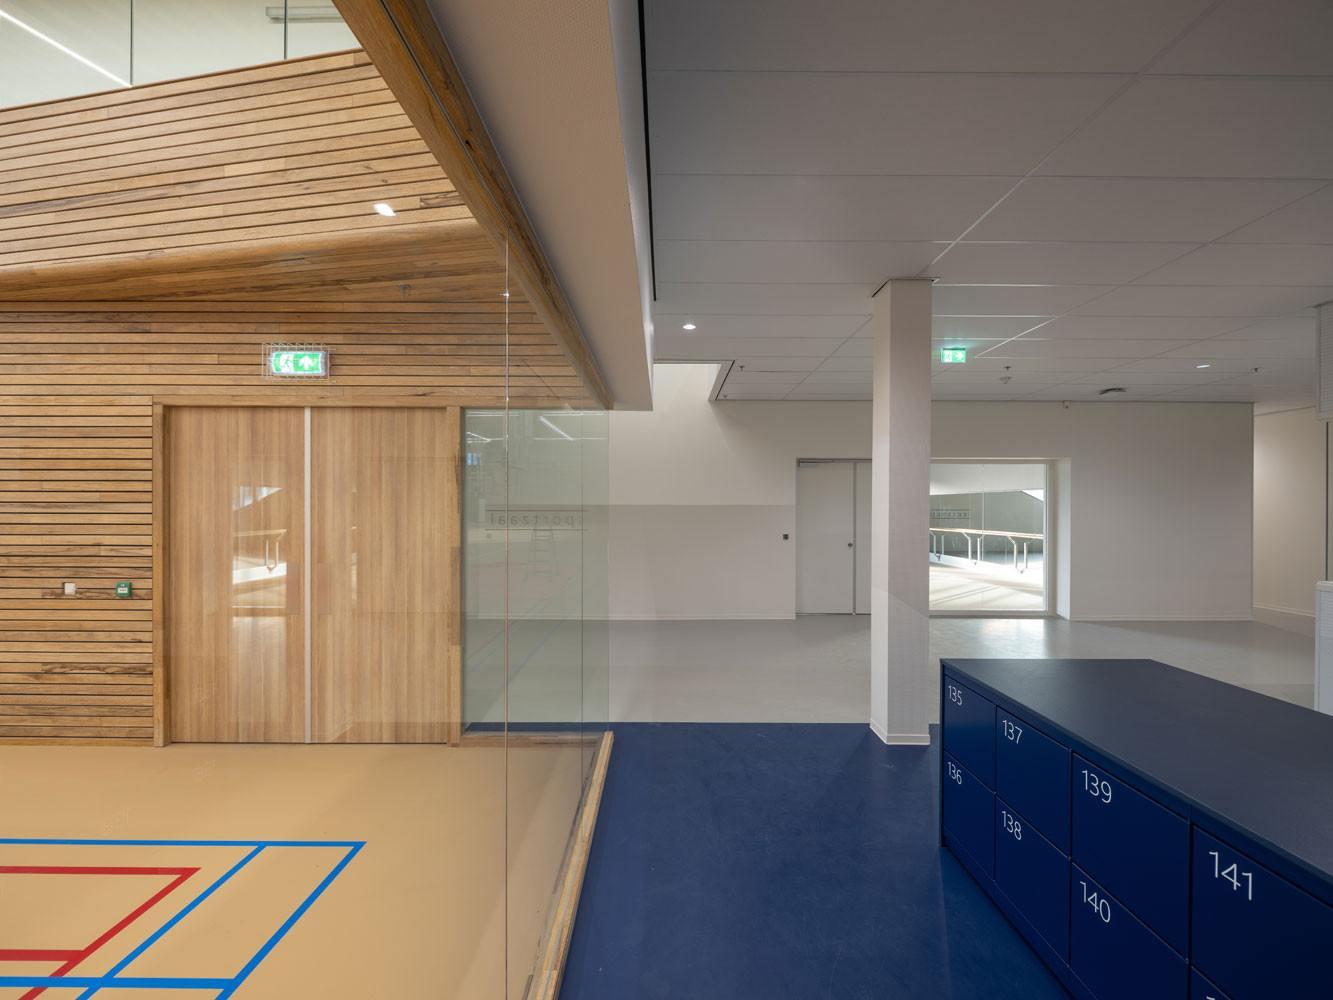 Sportcentrum-Europapark_hal-sporthal_VenhoevenCS-Ossip-1333x1000